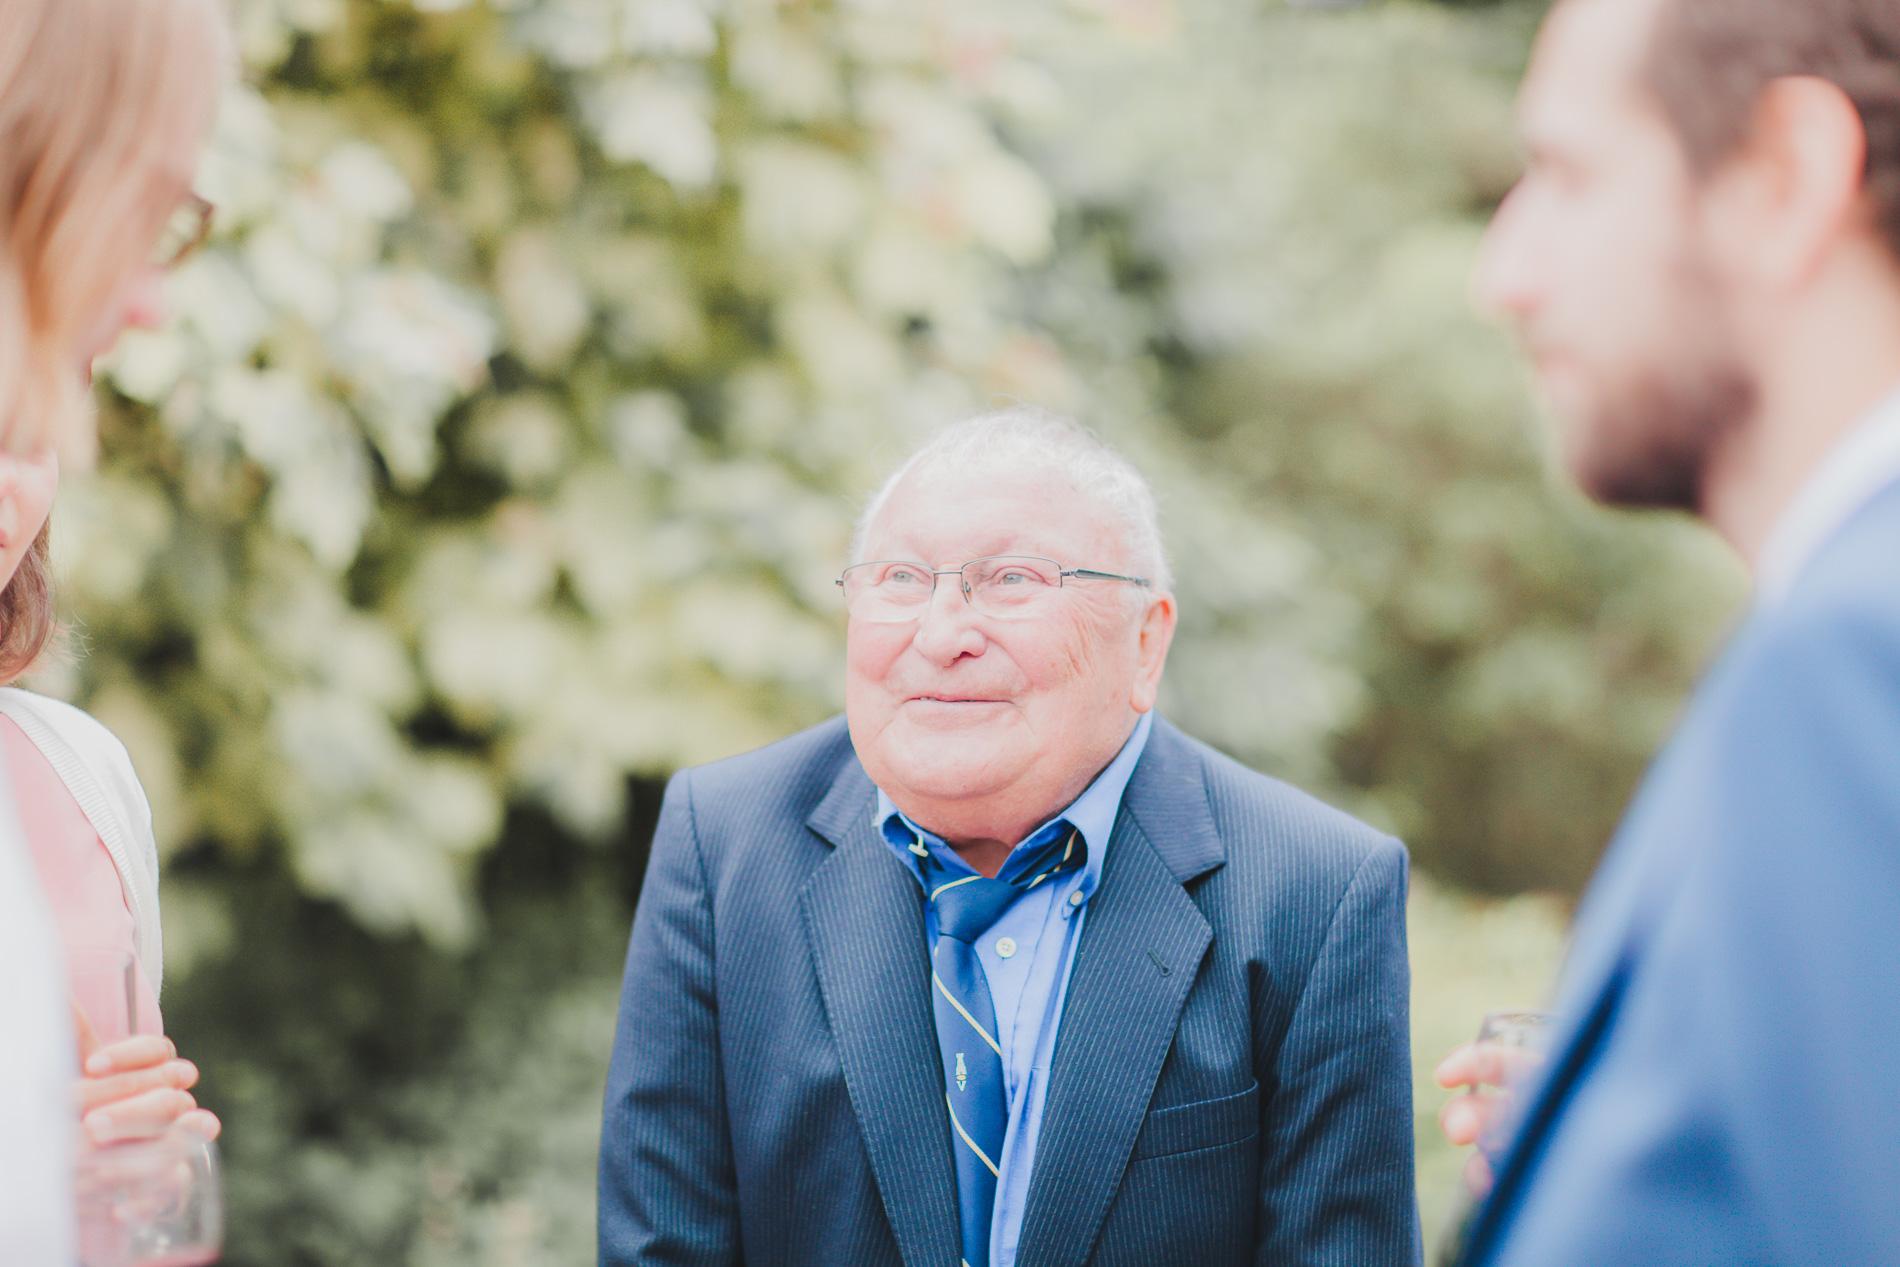 Granddad smiling